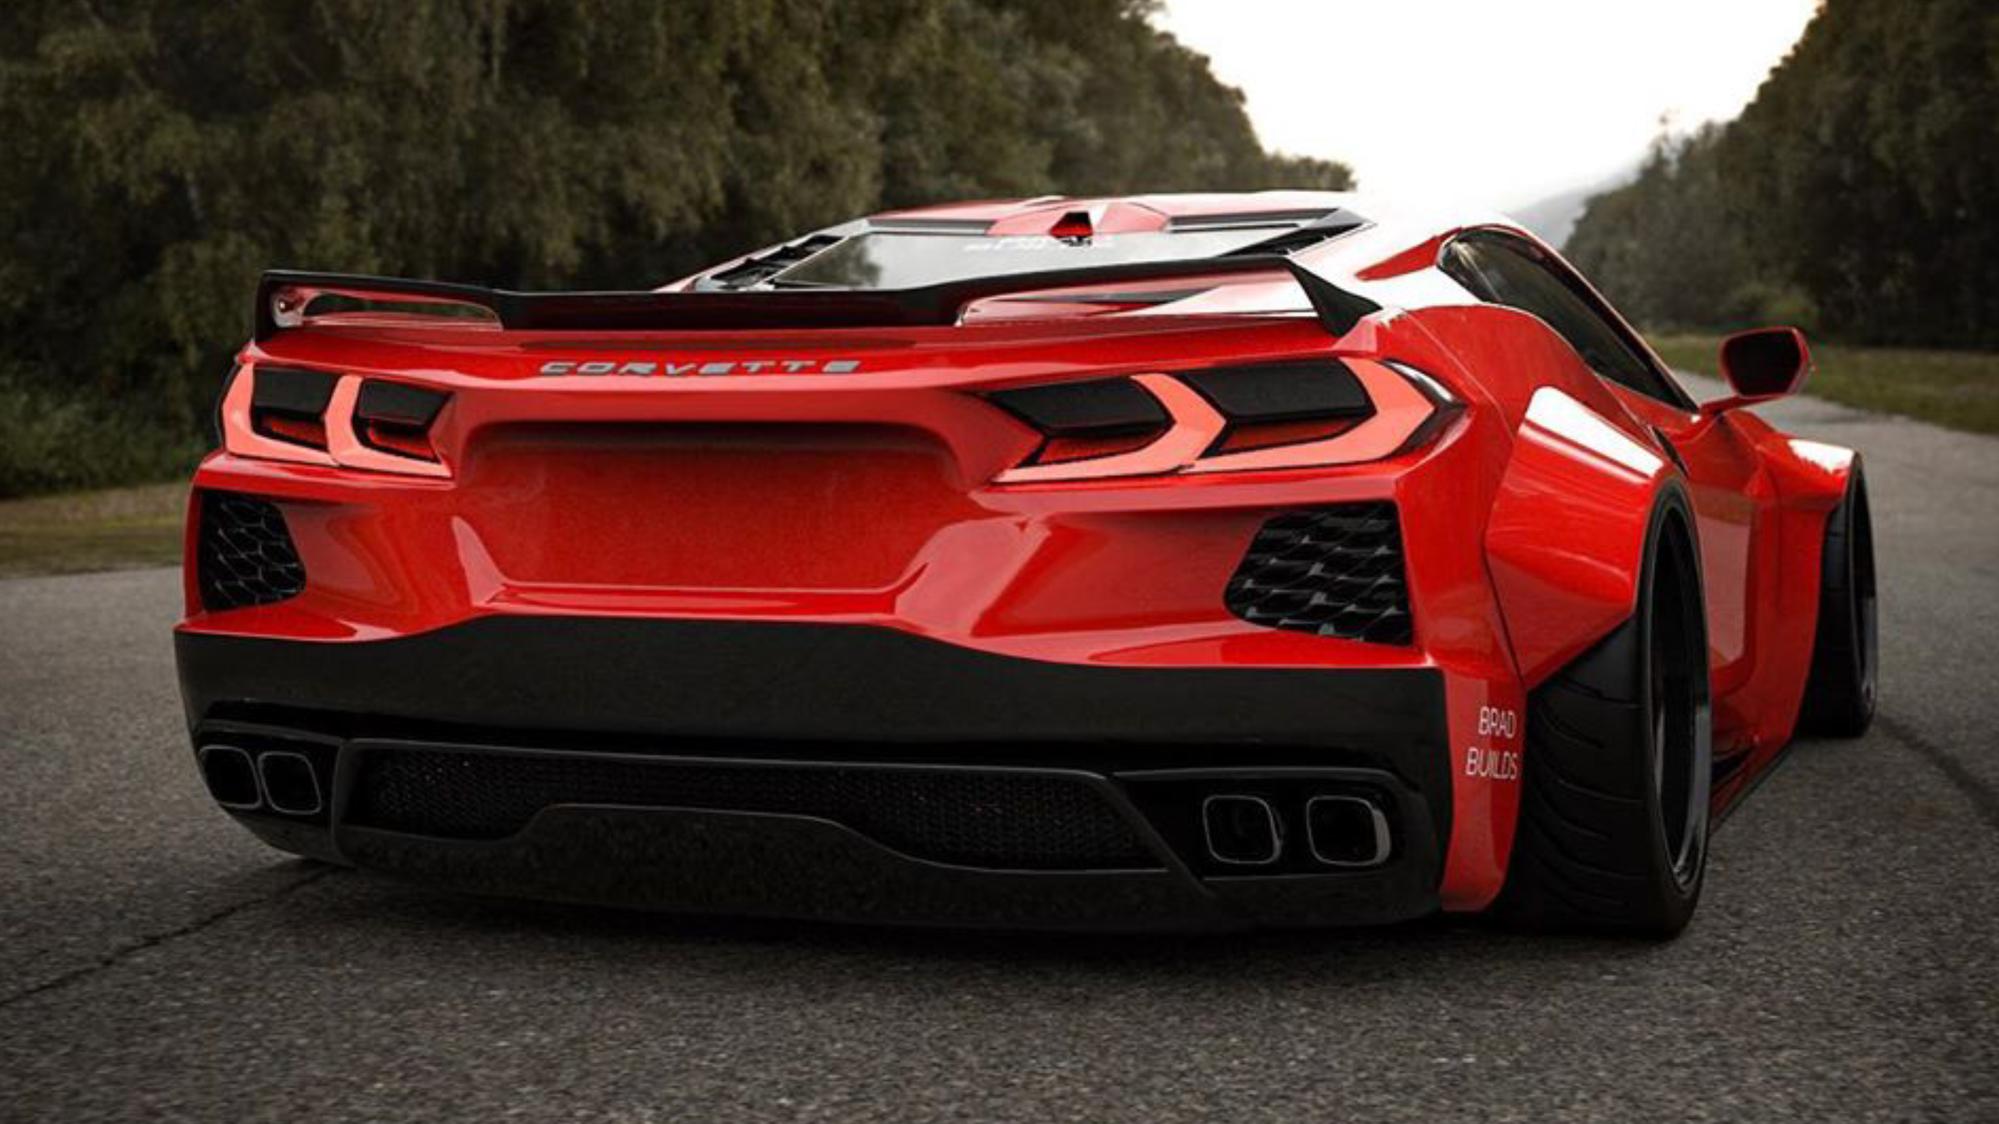 2020 Mid Engine Corvette C8 wide body render ...